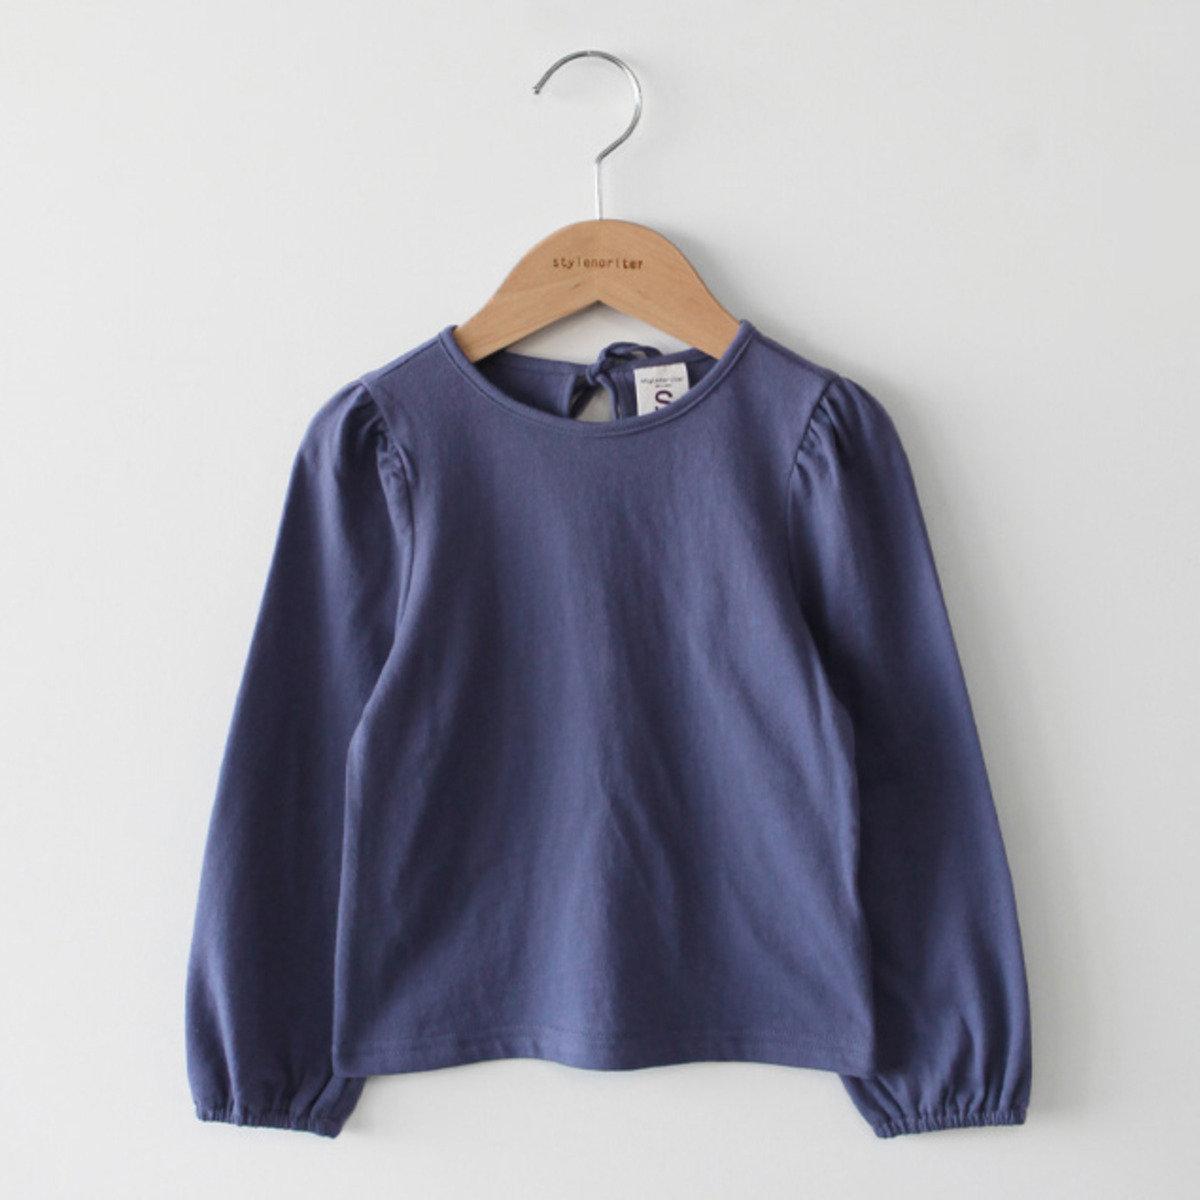 [16SP] 糖果色長袖上衣_S63751